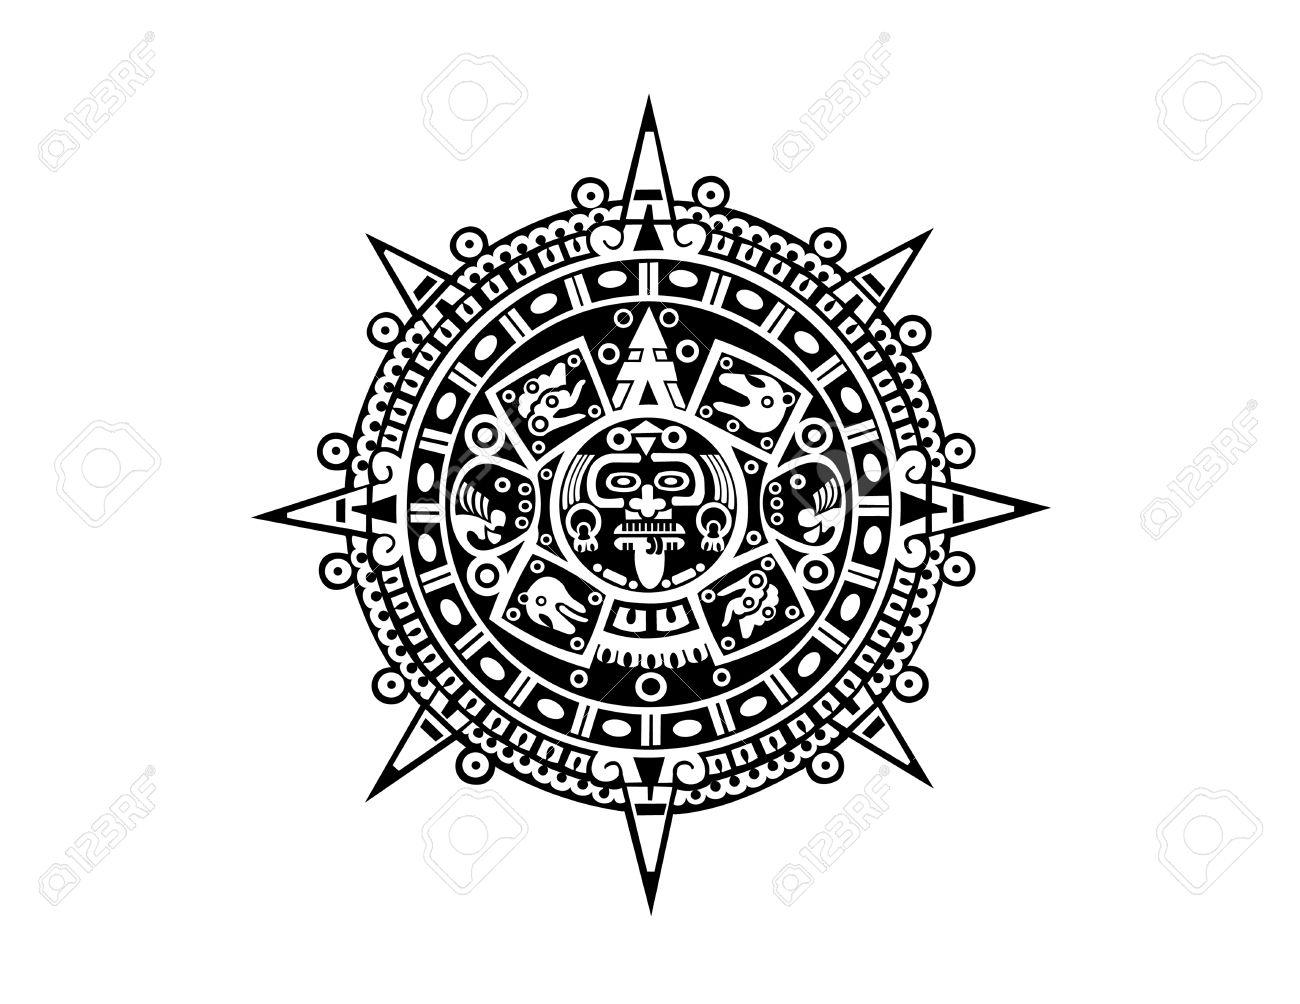 Aztec Calendar with Aztec Calendar Template